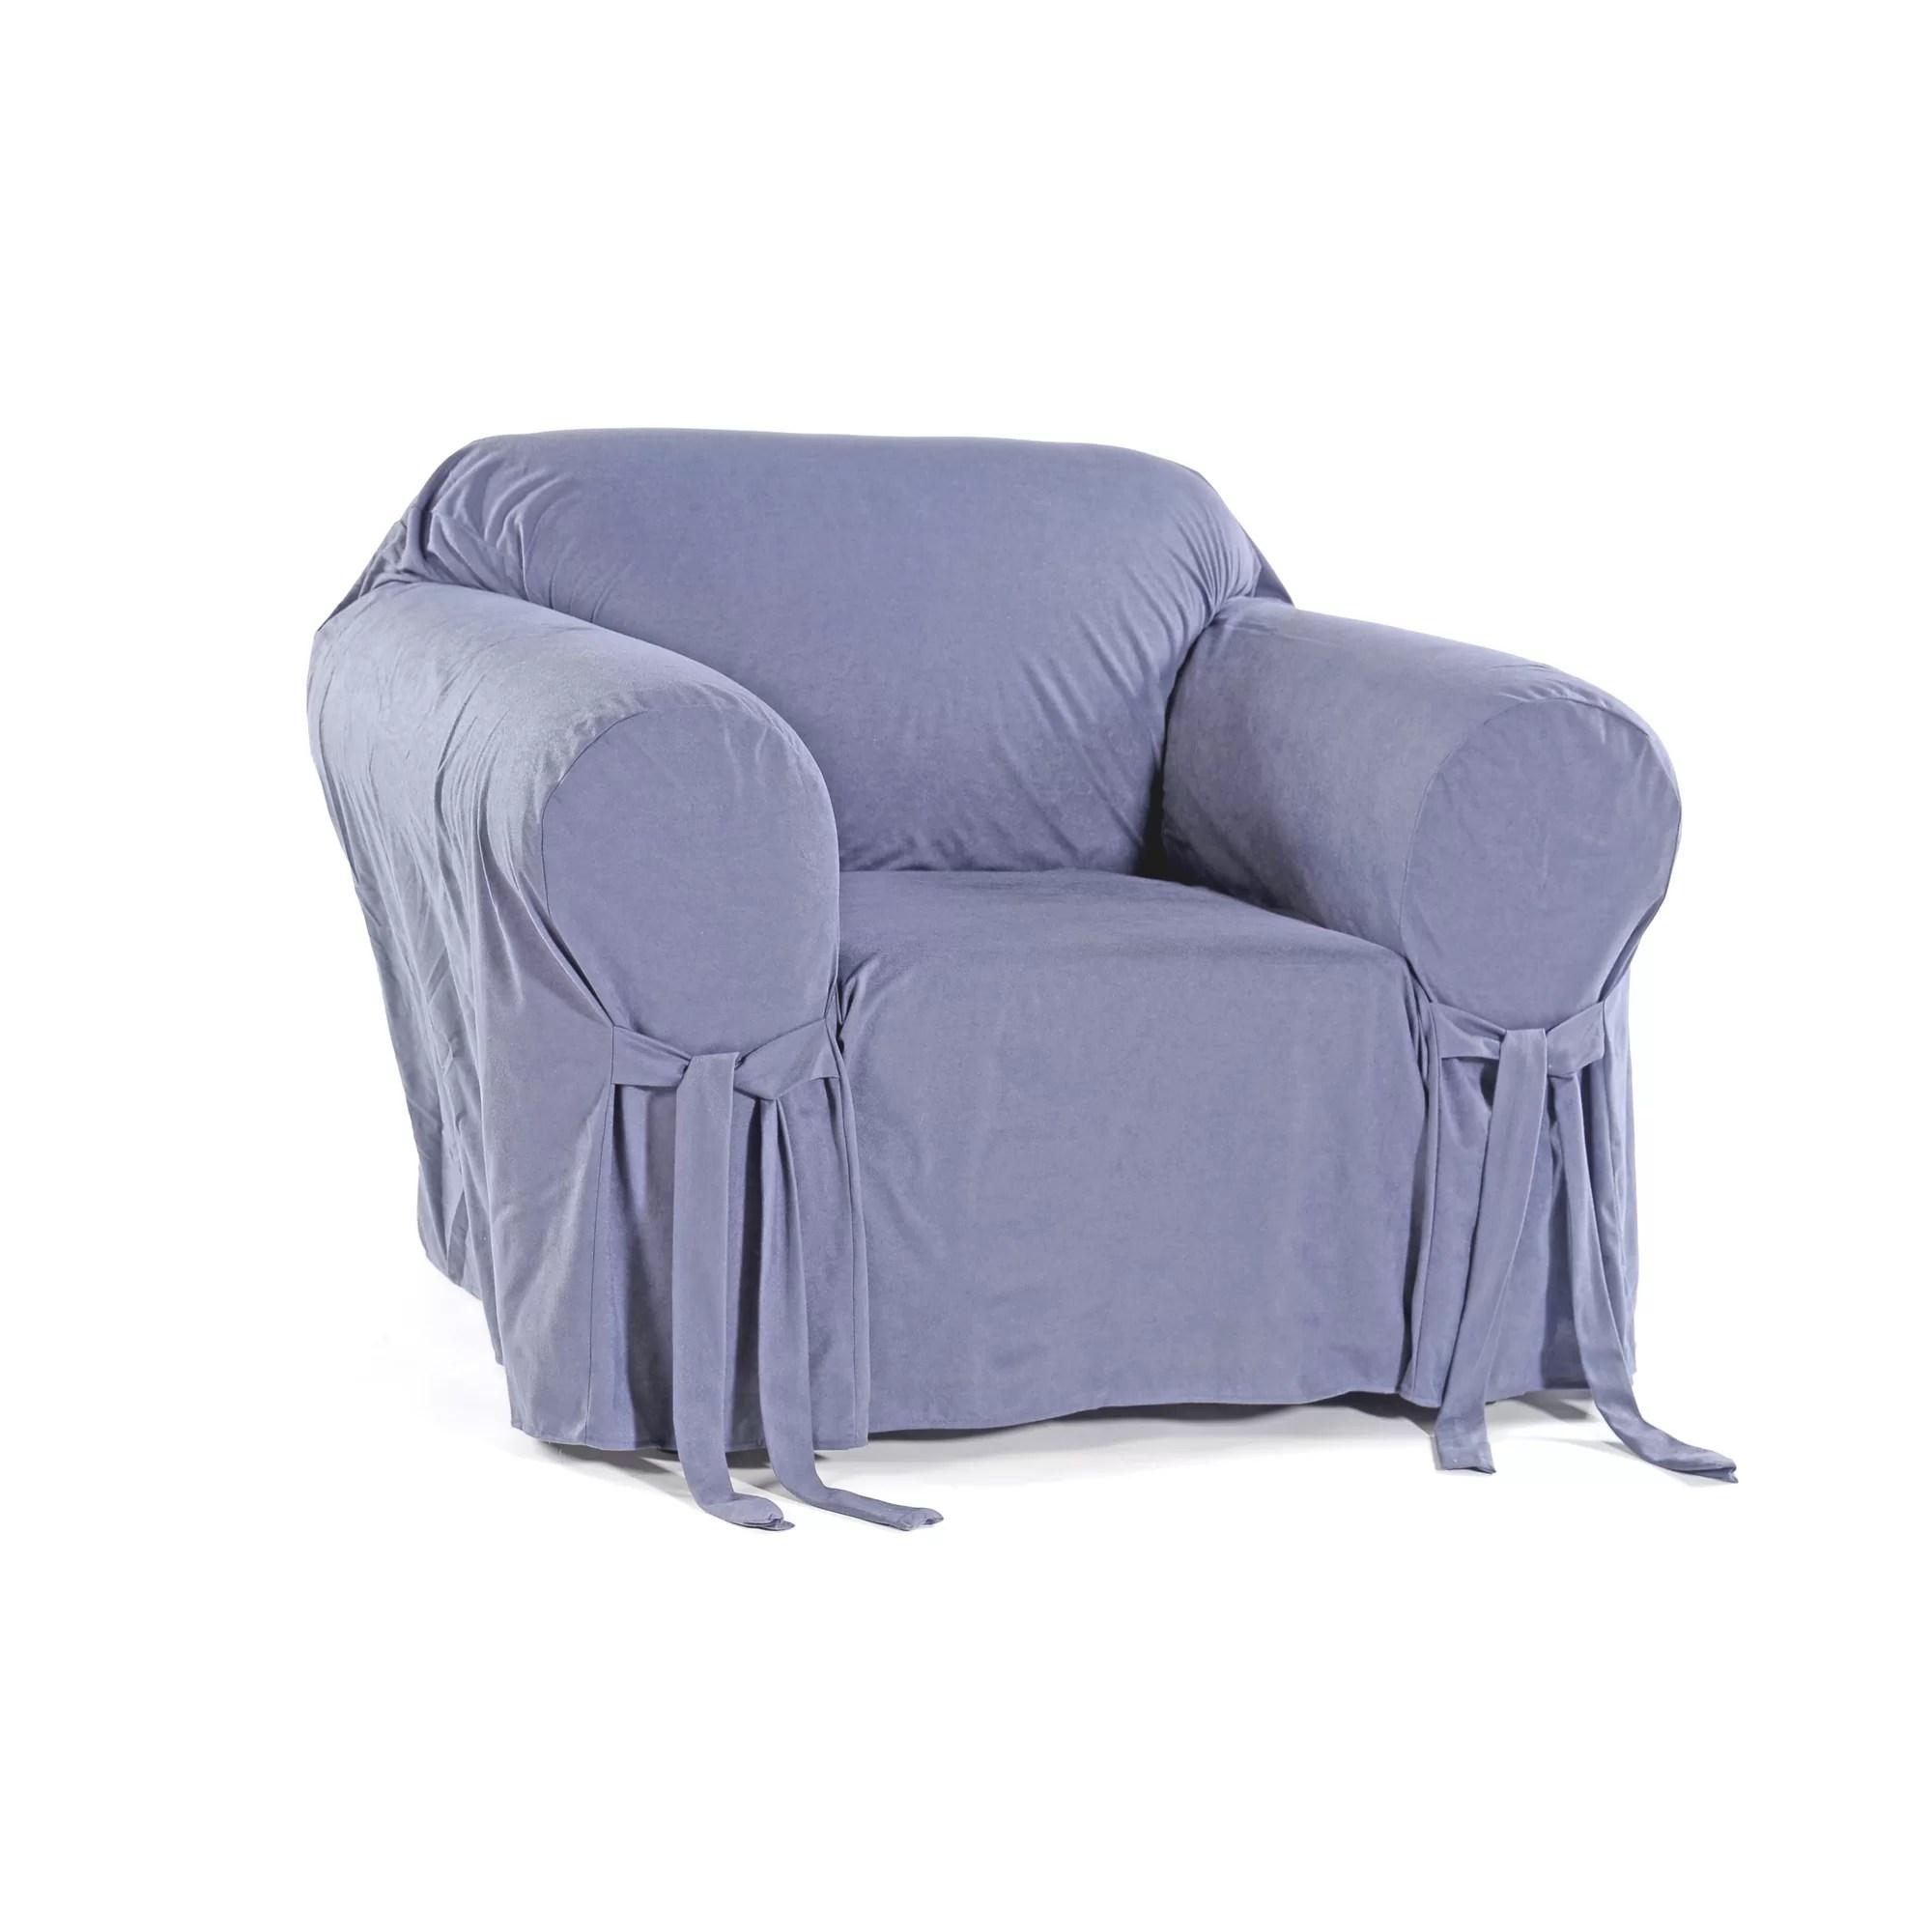 Classic Slipcovers Arm Chair Slipcover  Wayfair